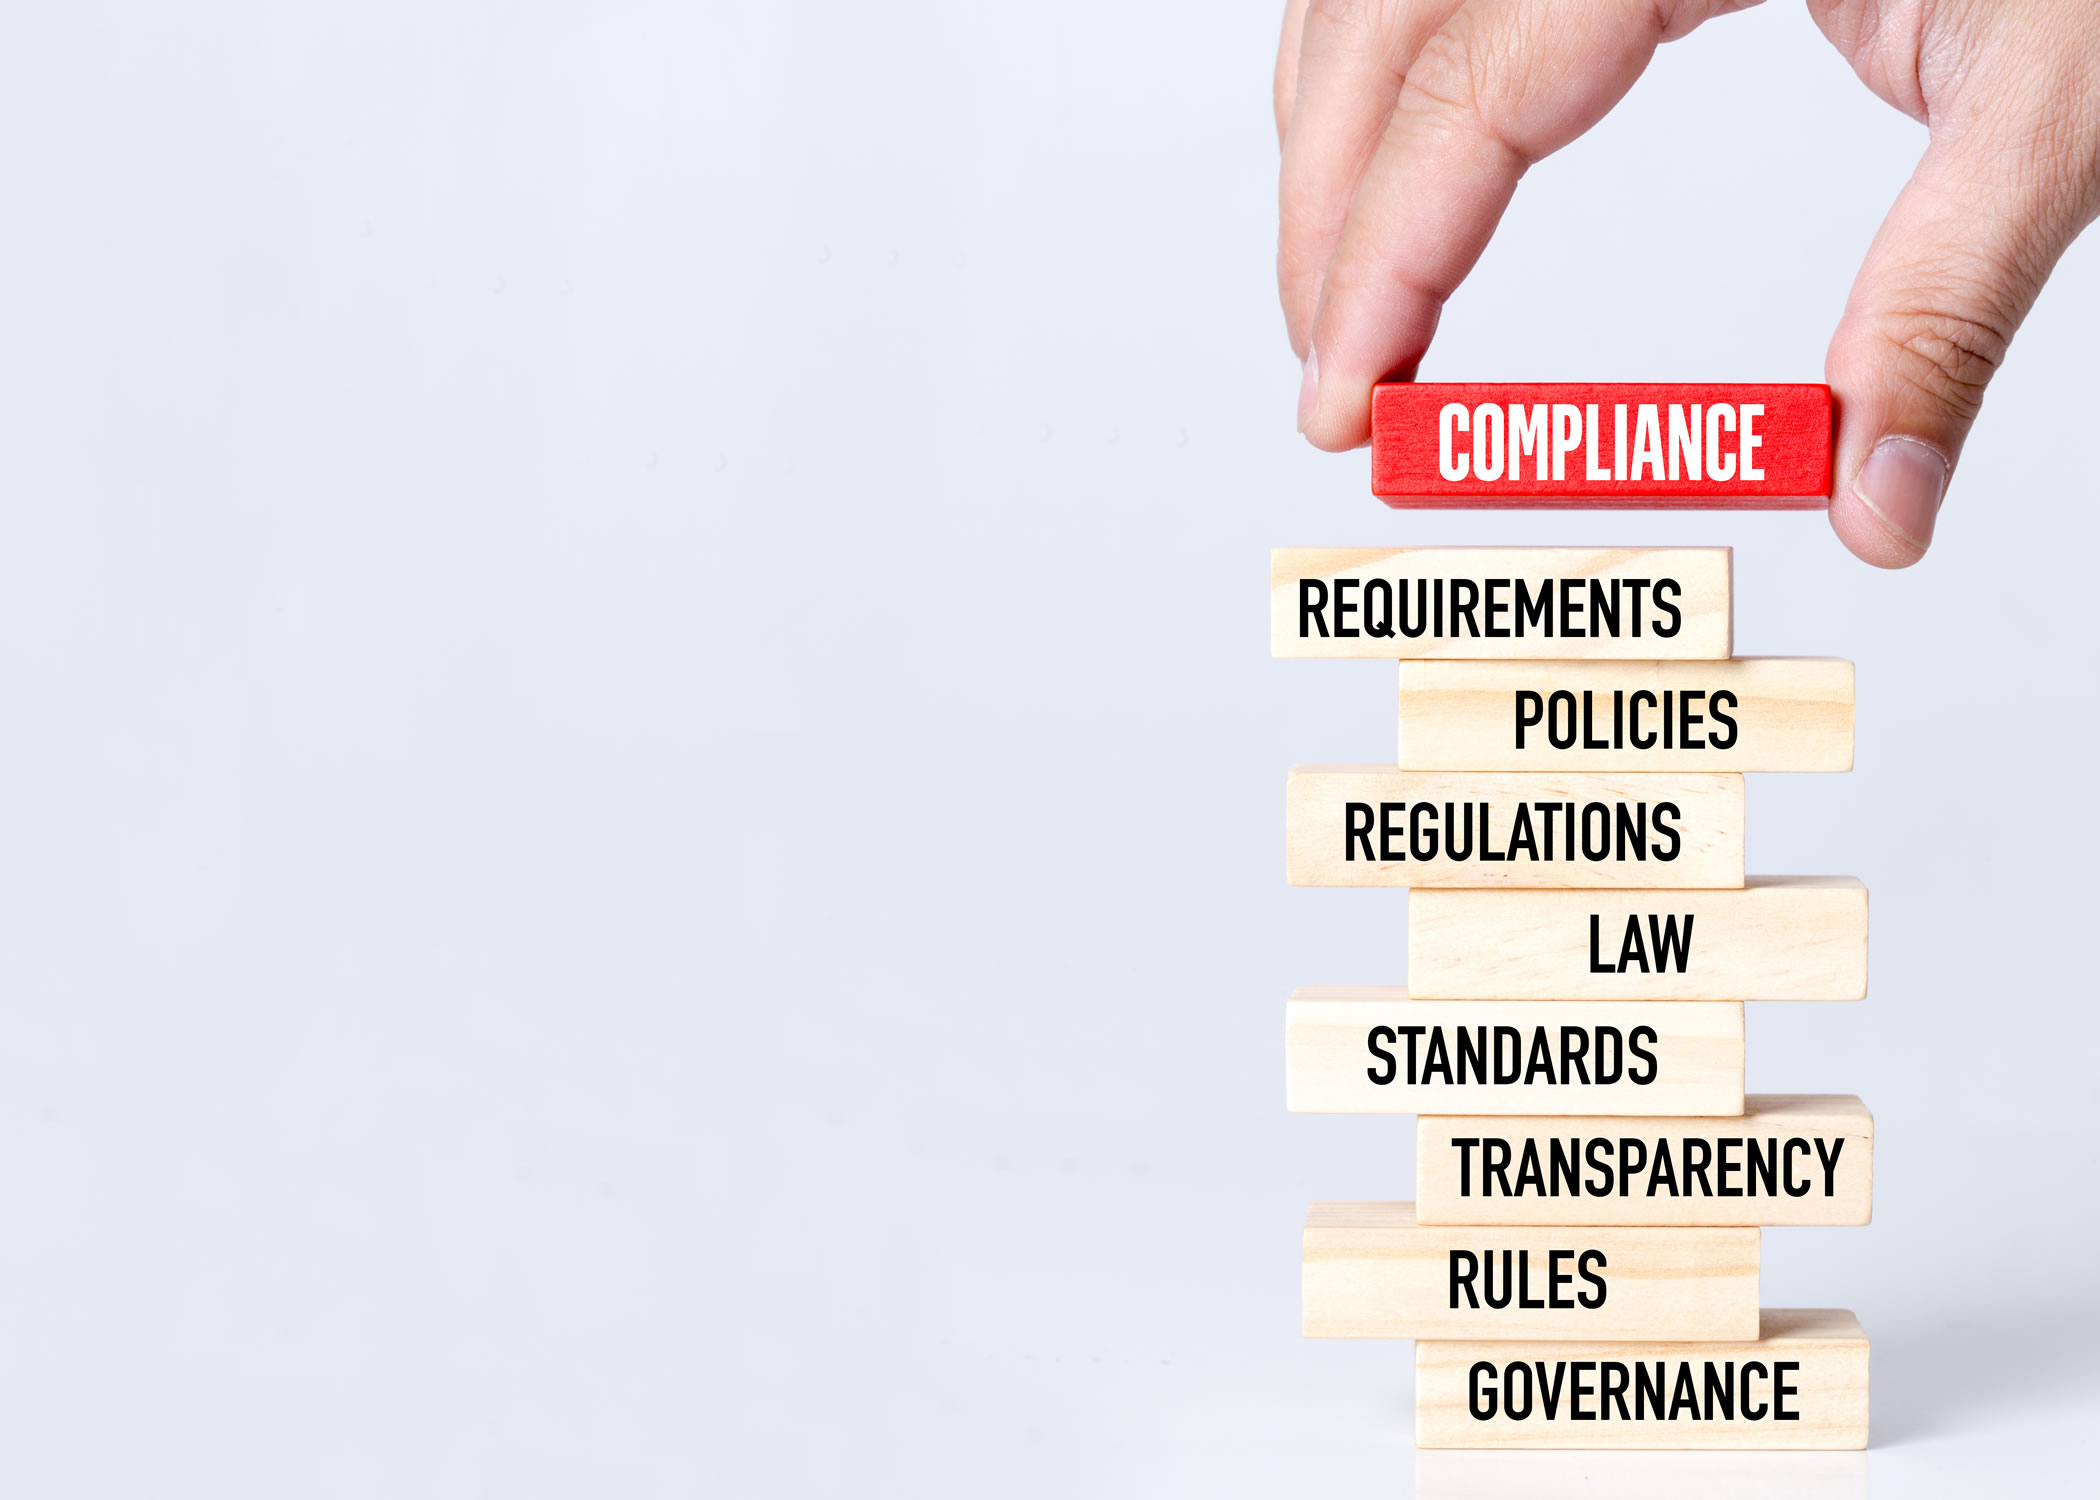 Preparing for an OFCCP Compliance Reivew (Establishment and FAAPS)